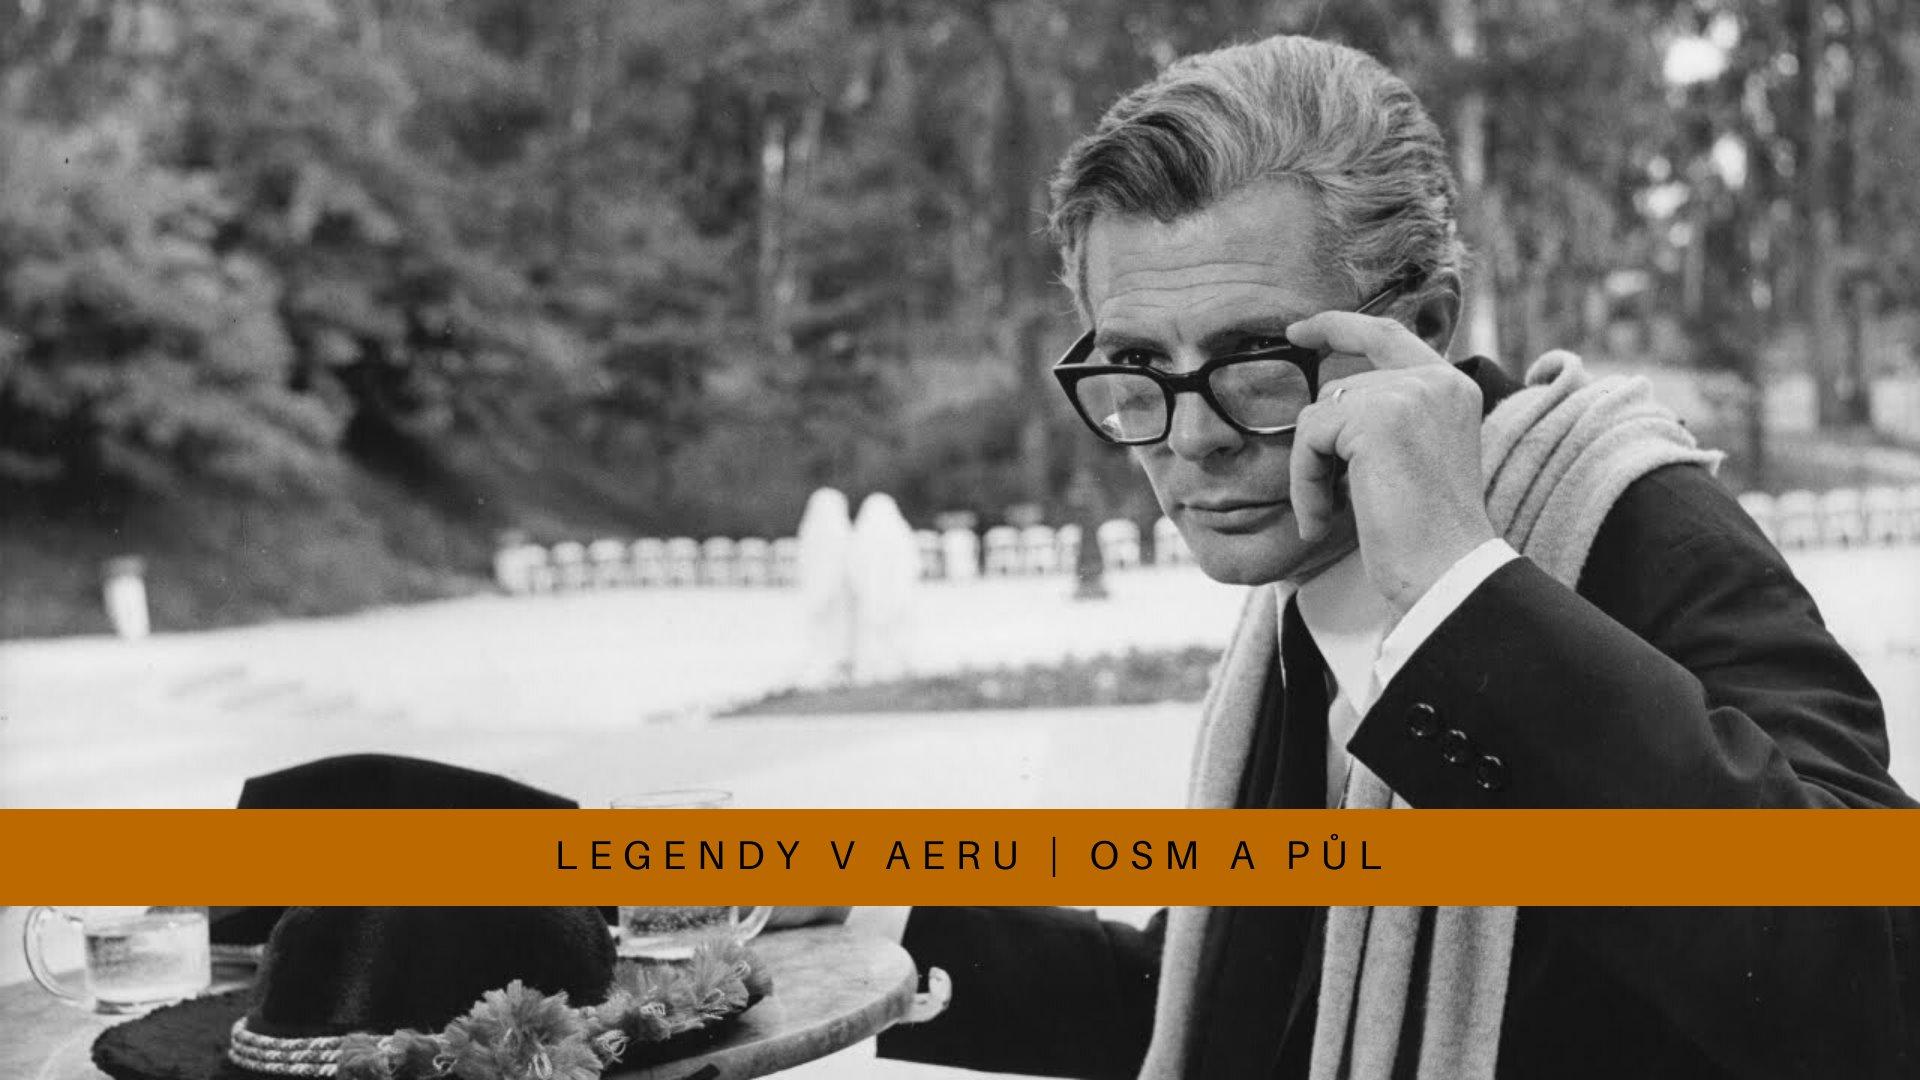 Legendy v Aeru: Osm a půl